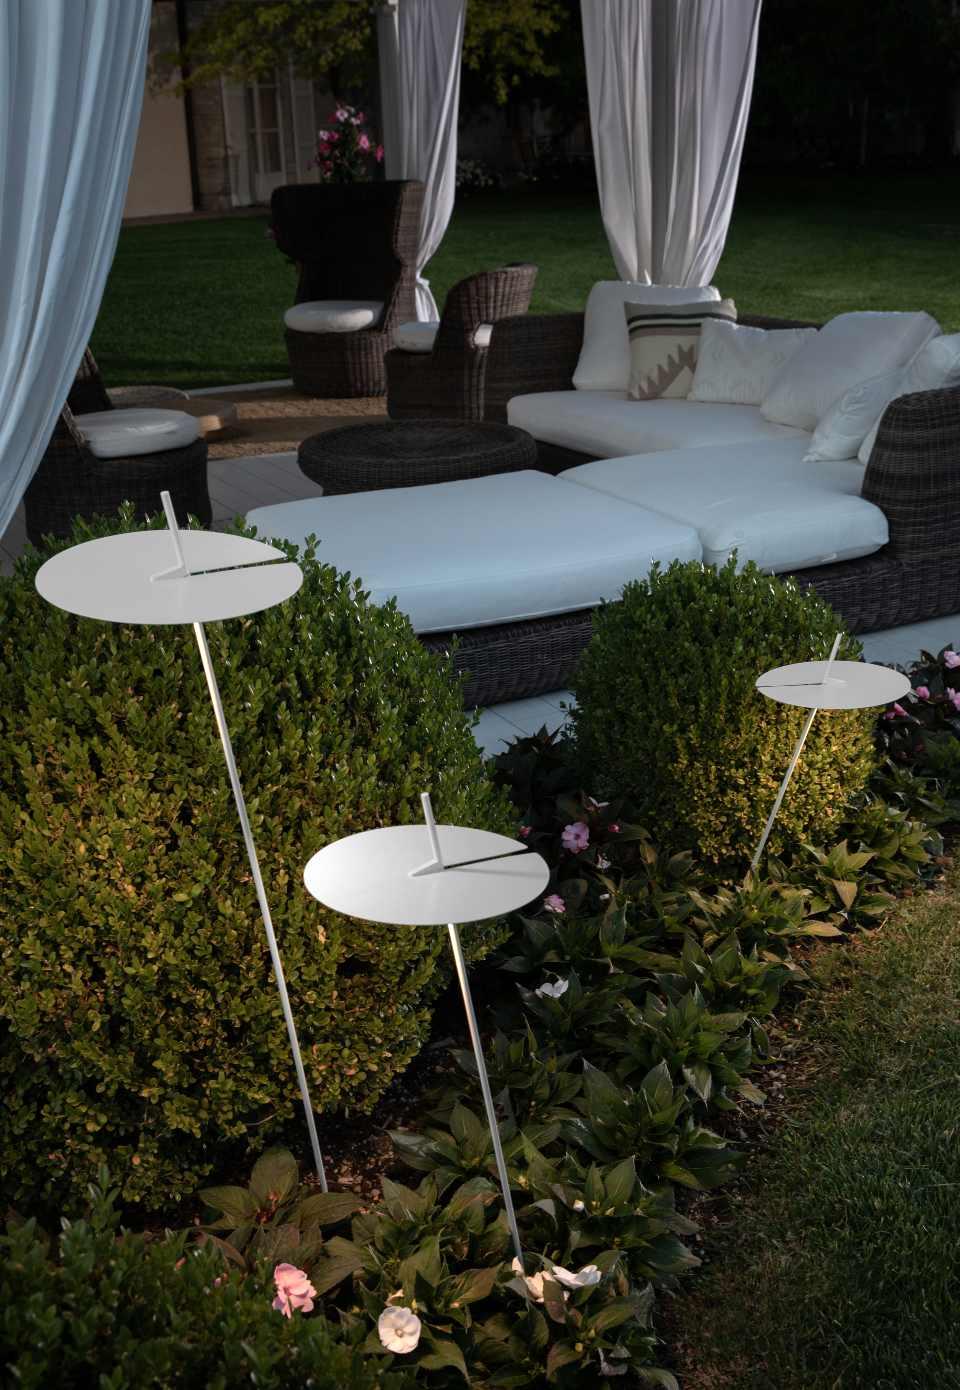 xana-illuminazione-decorativa-outdoor